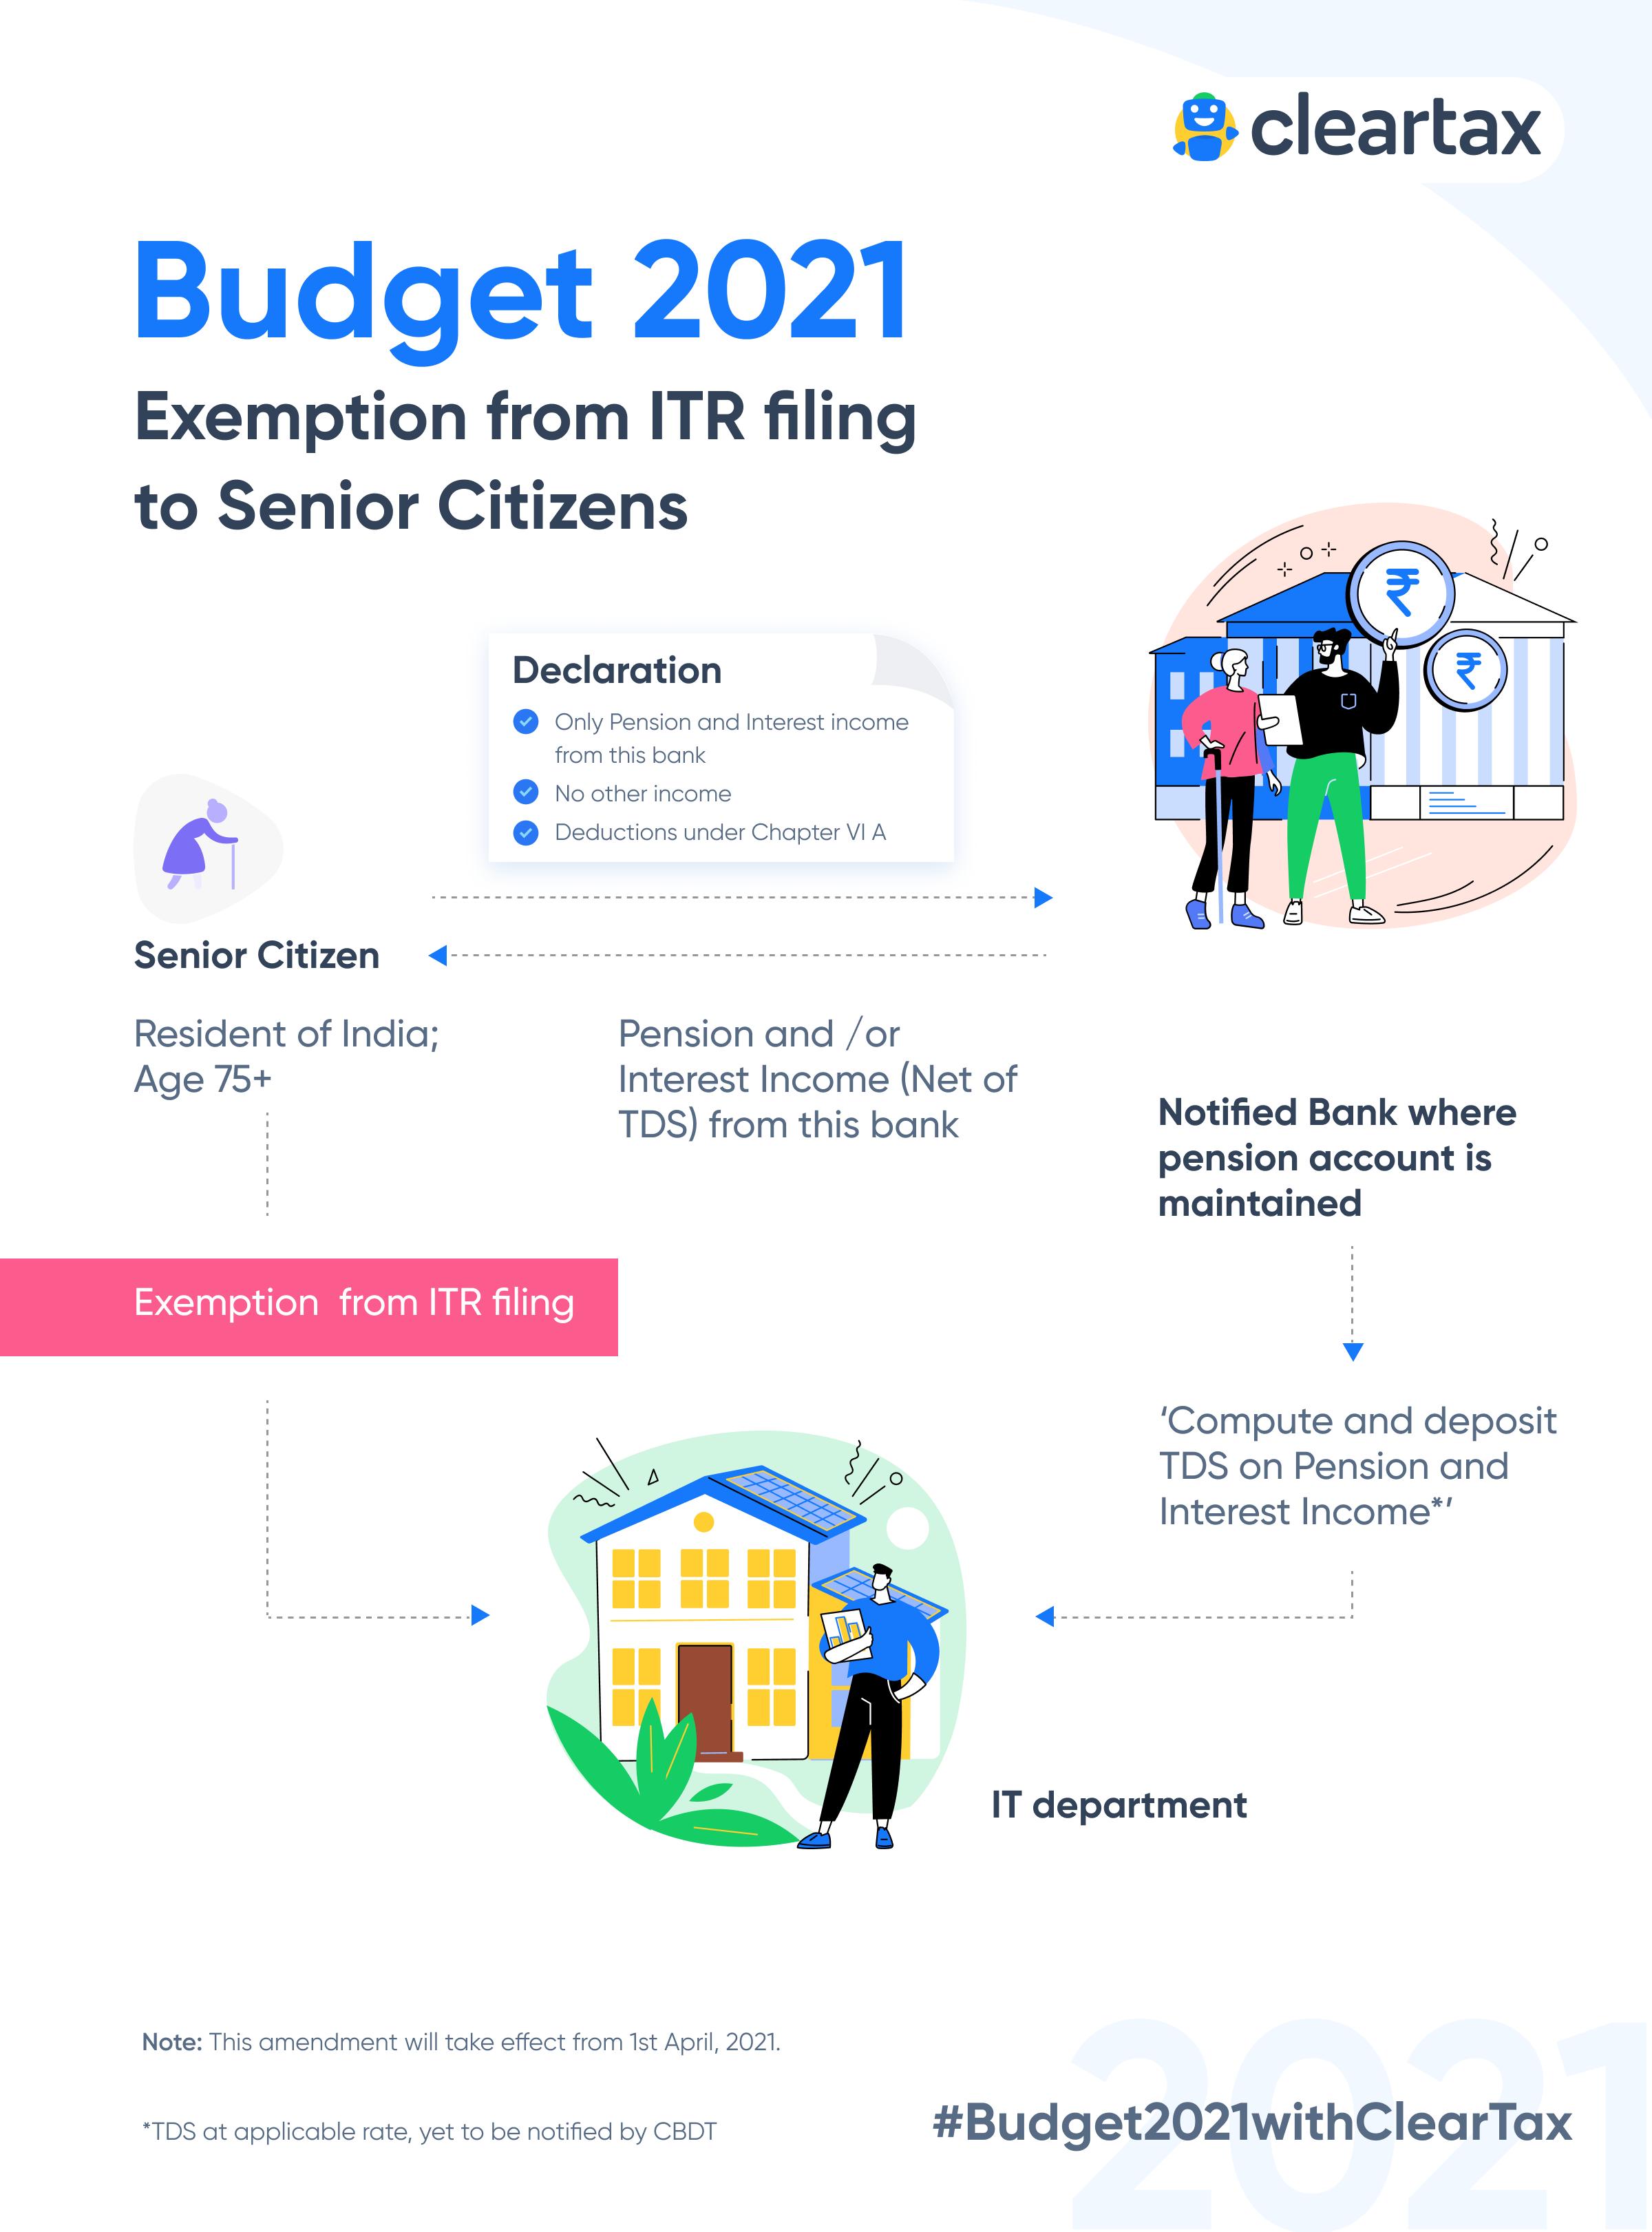 Exemption of ITR filing to senior citizens